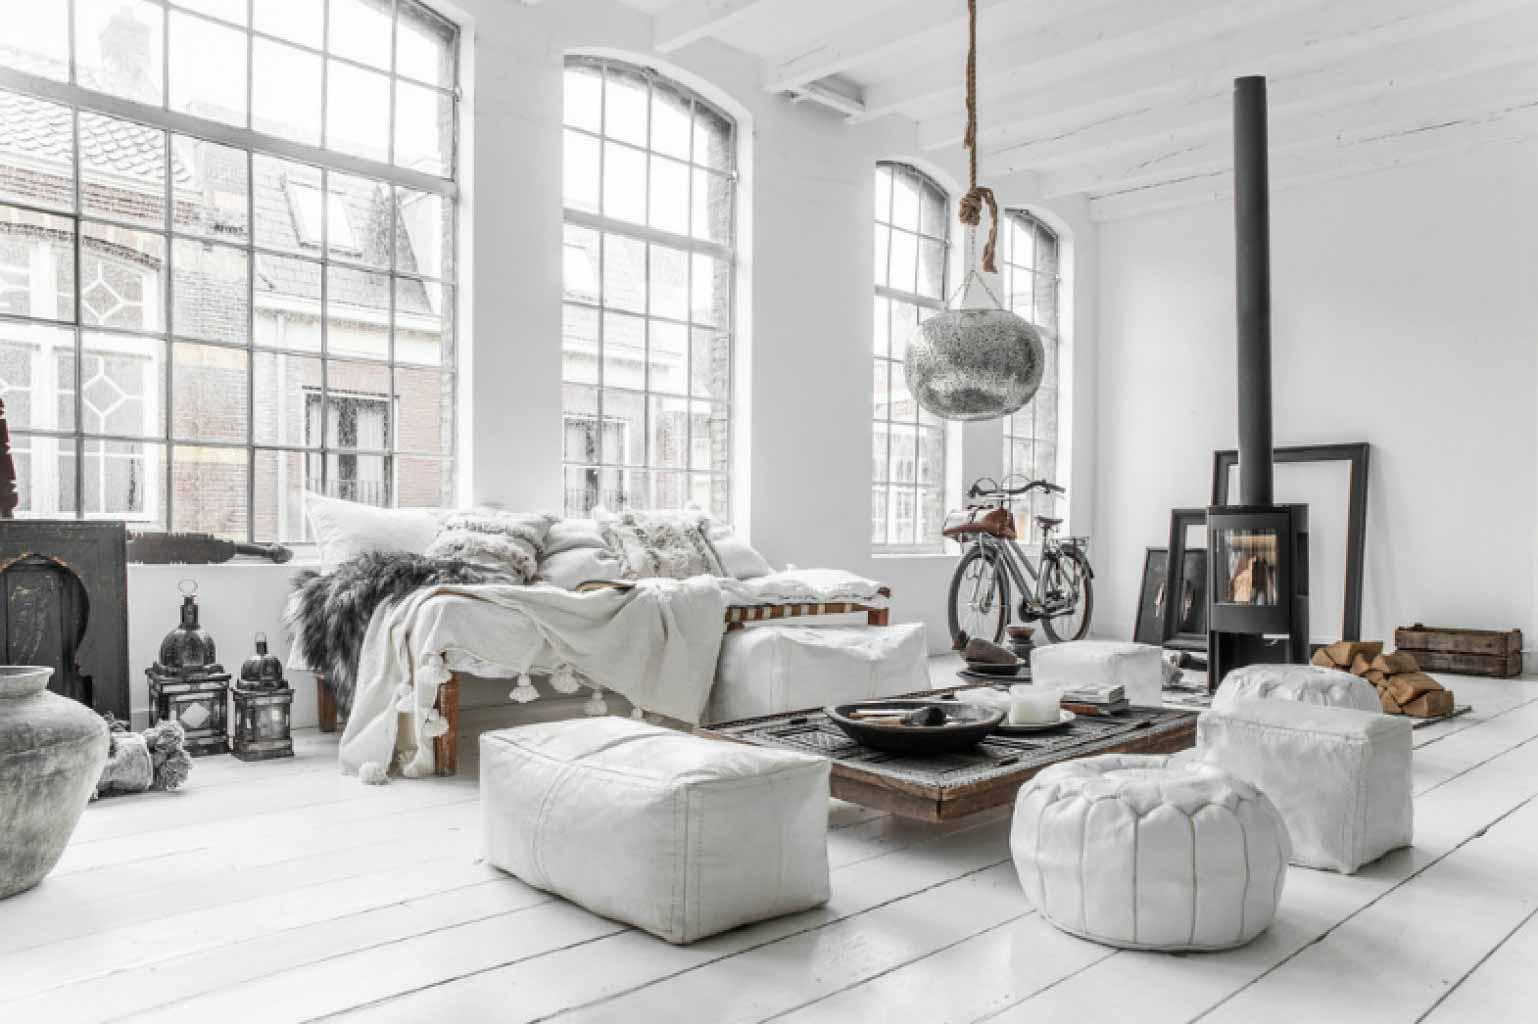 bộ sofa trắng